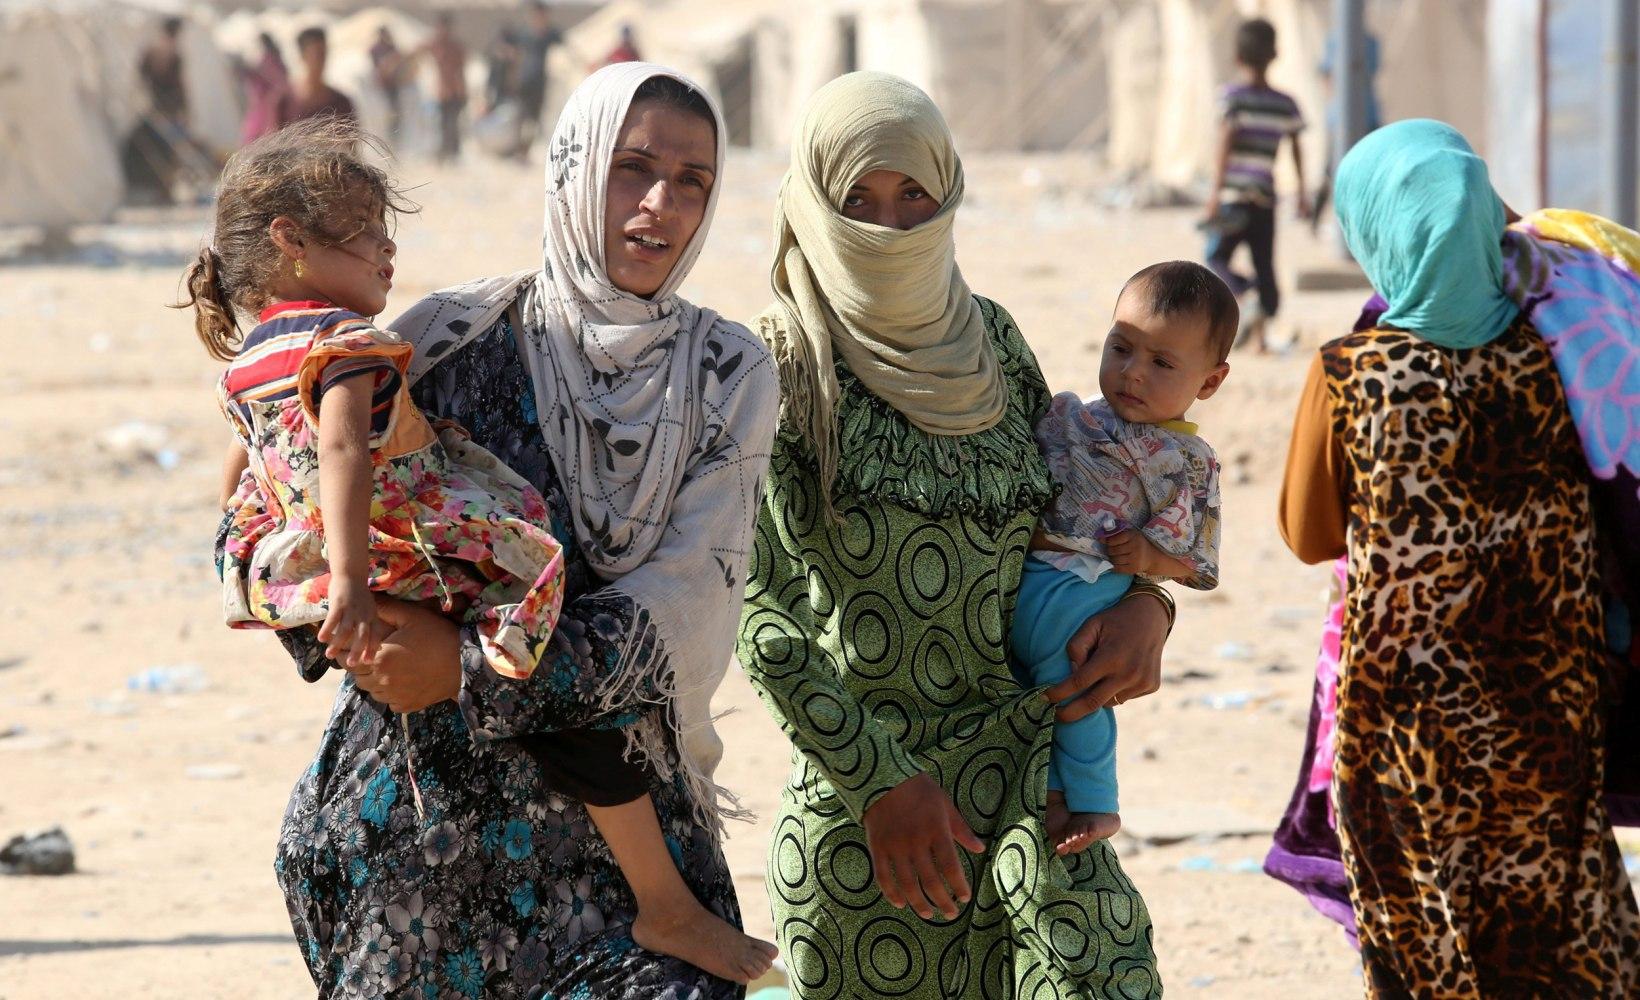 ISIS May Be Holding 3,000 Iraqi Civilians as Human Shields: UN